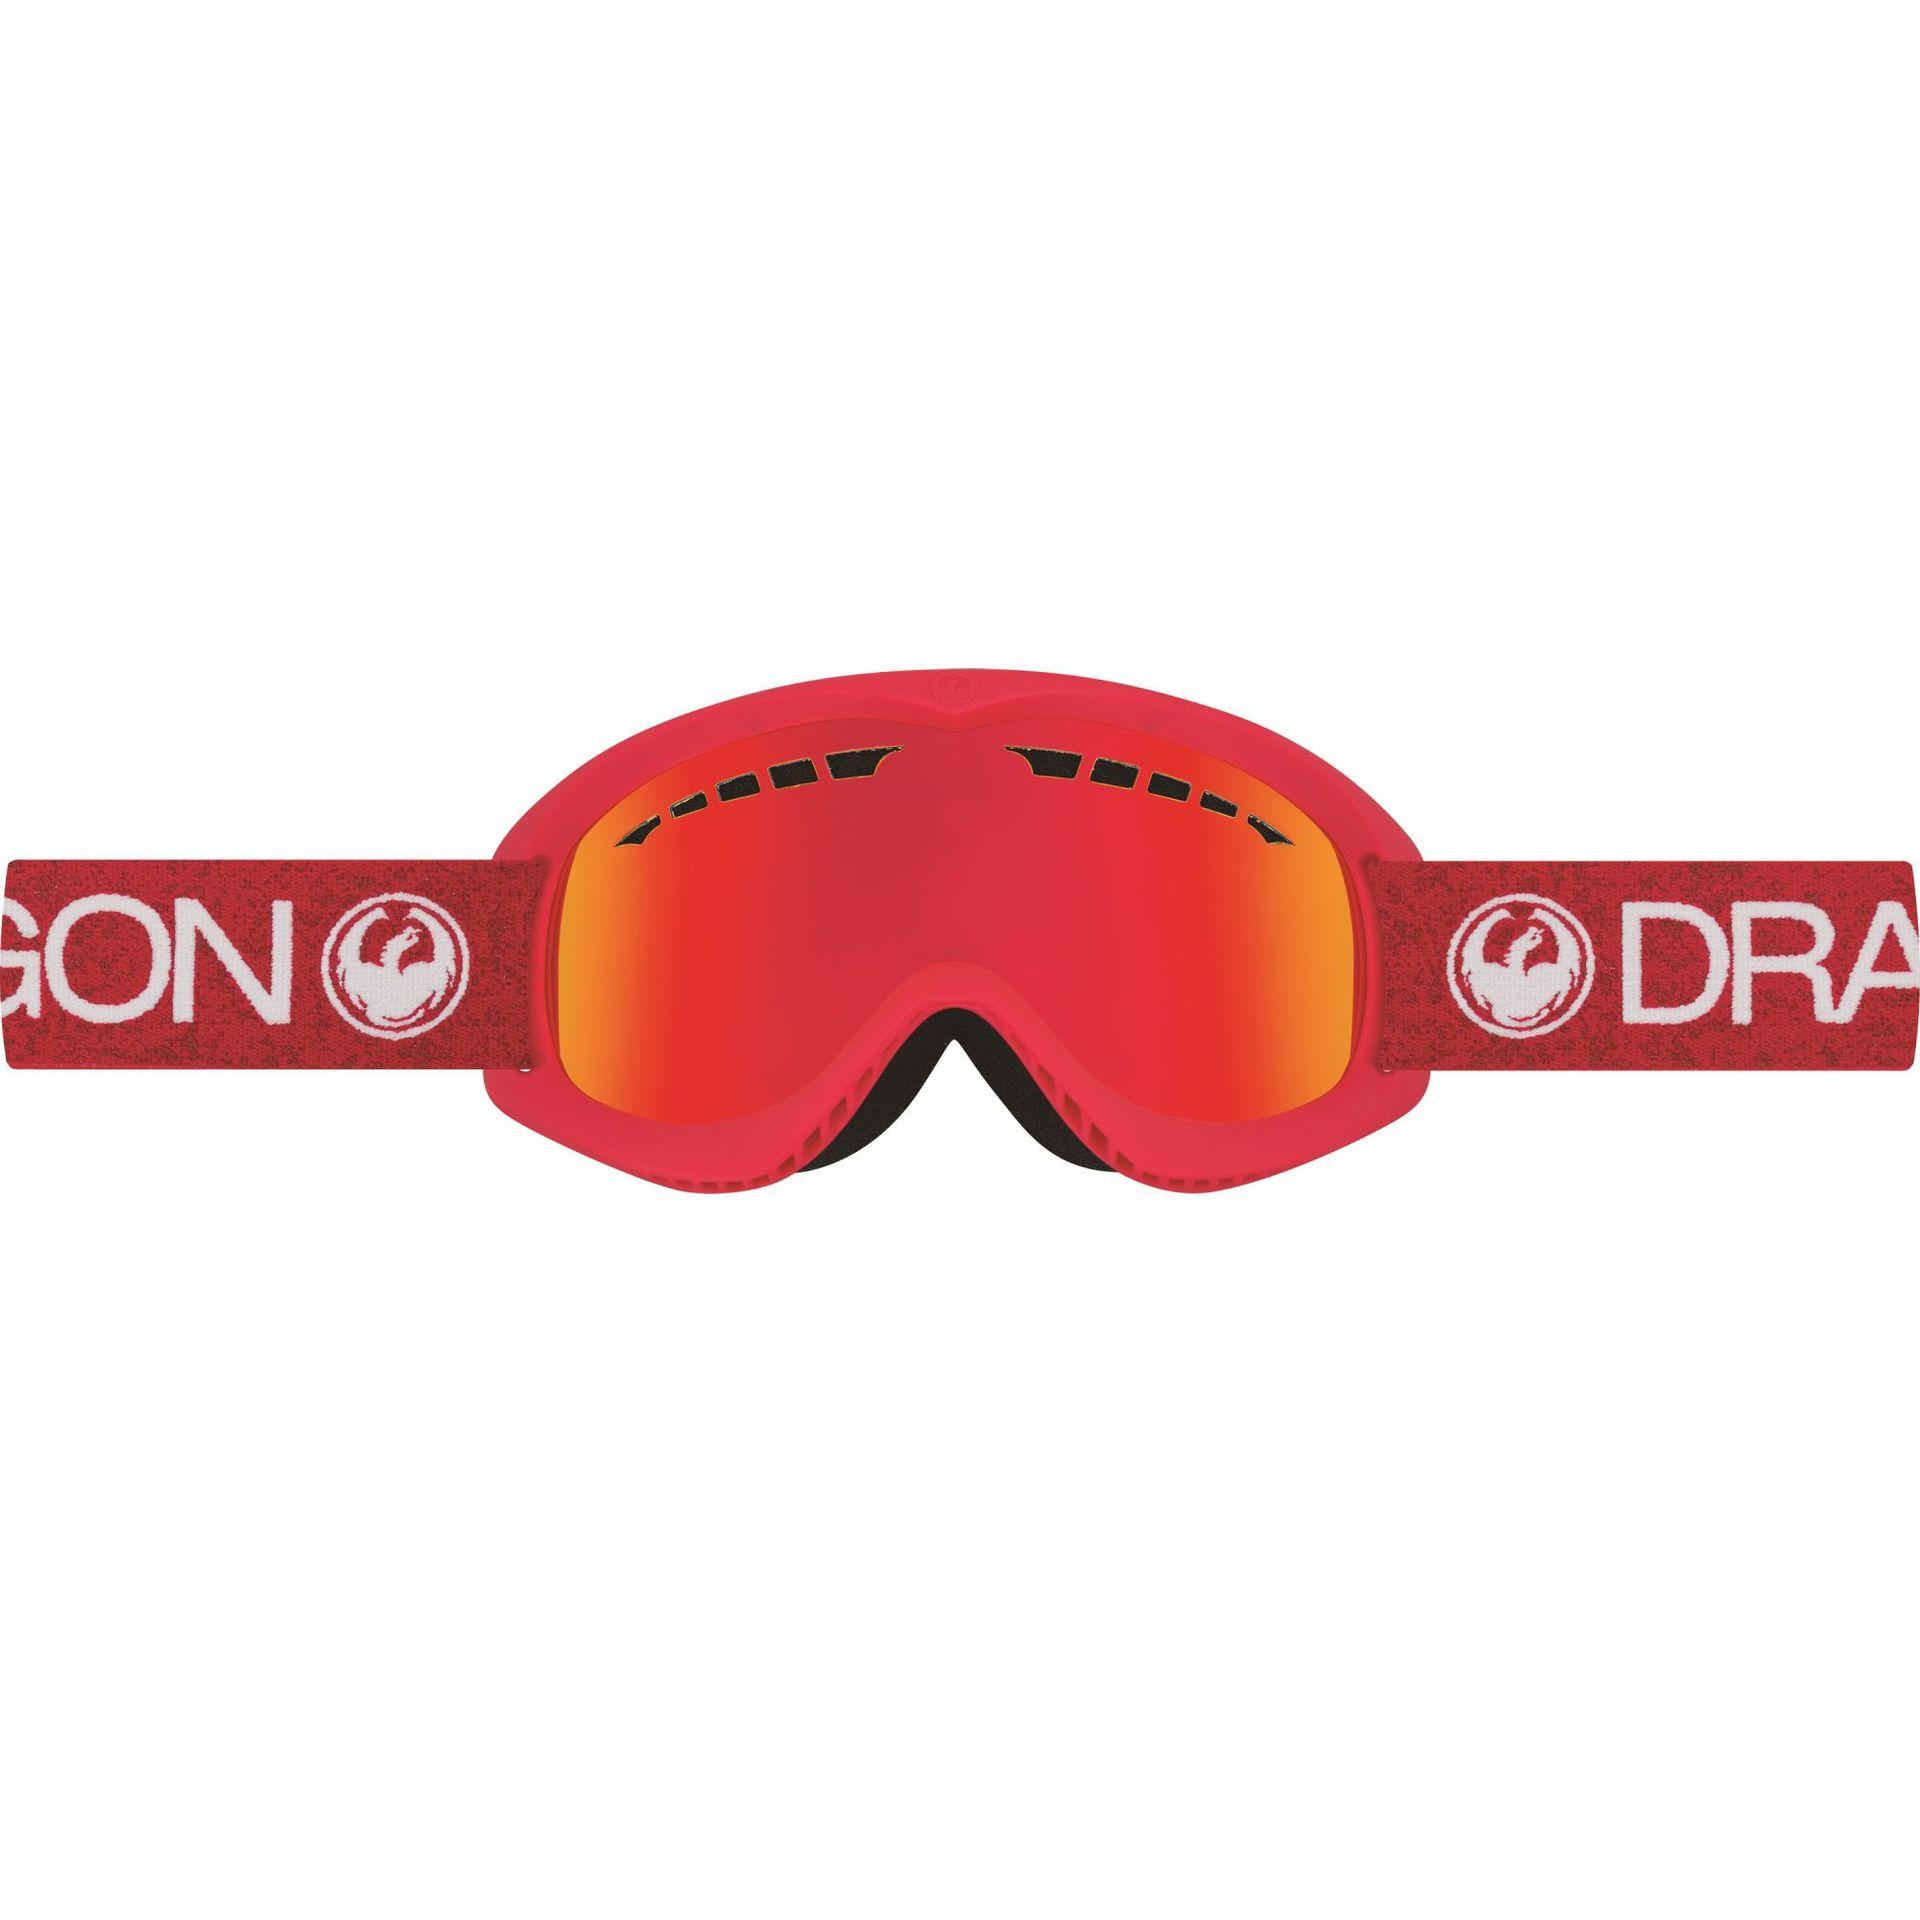 GOGLE DRAGON DX 6326 1